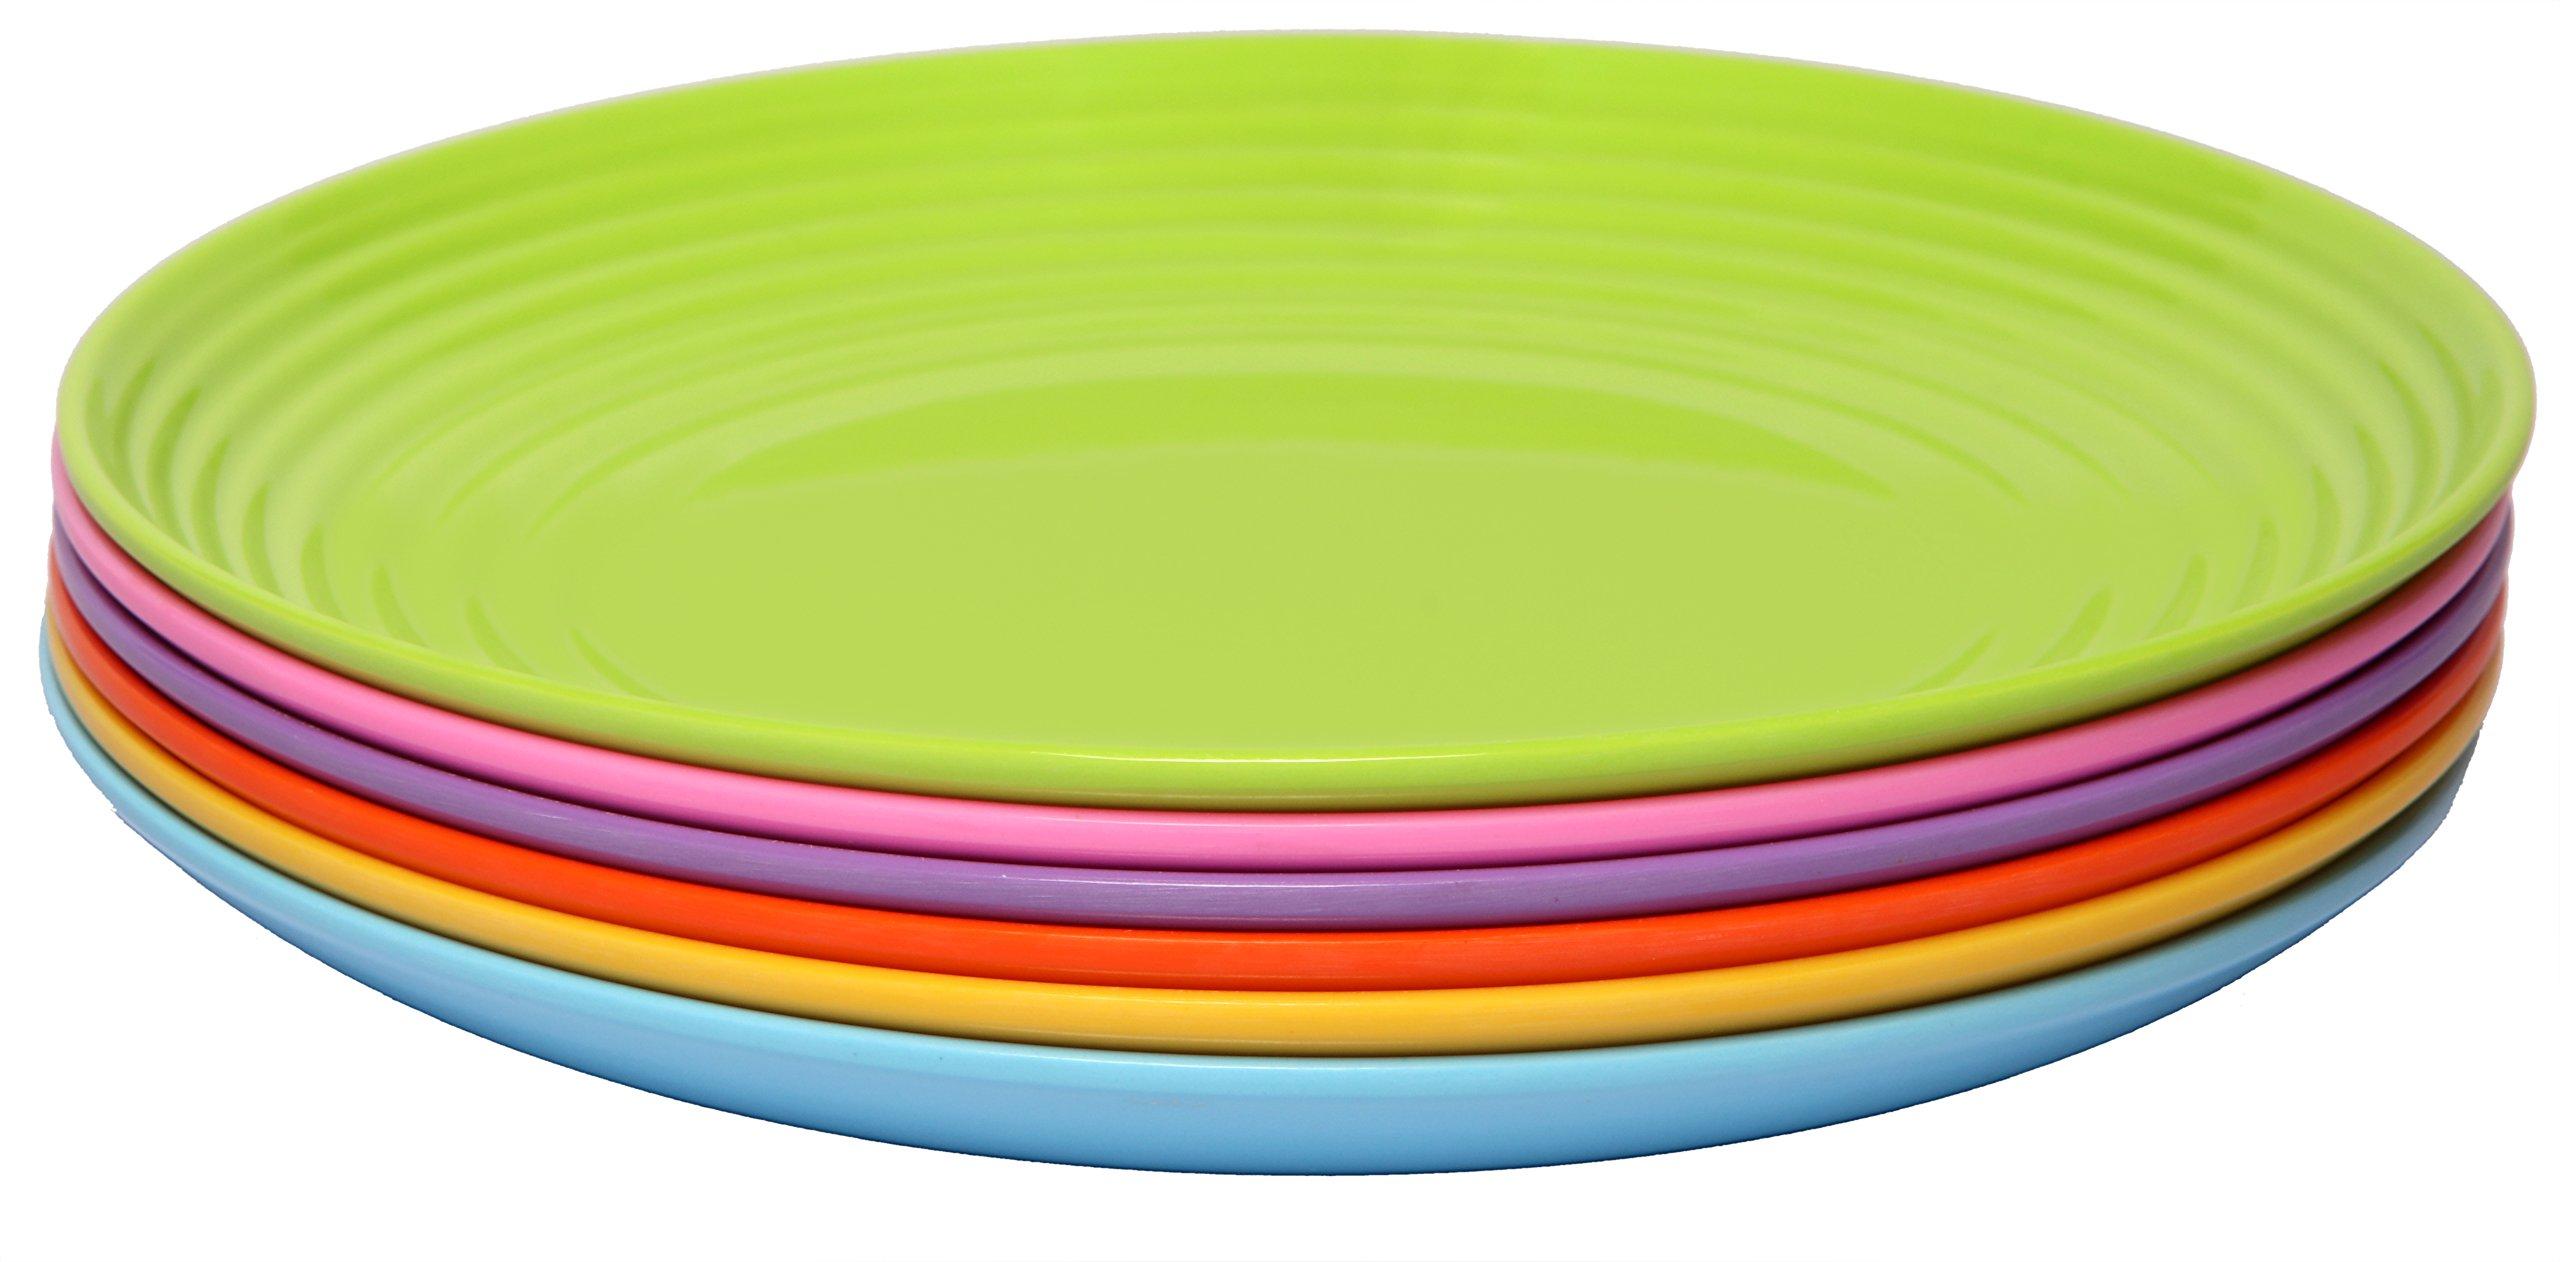 Melange 6-Piece Melamine Dinner Plate Set (Solids Collection) | Shatter-Proof and Chip-Resistant Melamine Dinner Plates | Color Multicolor